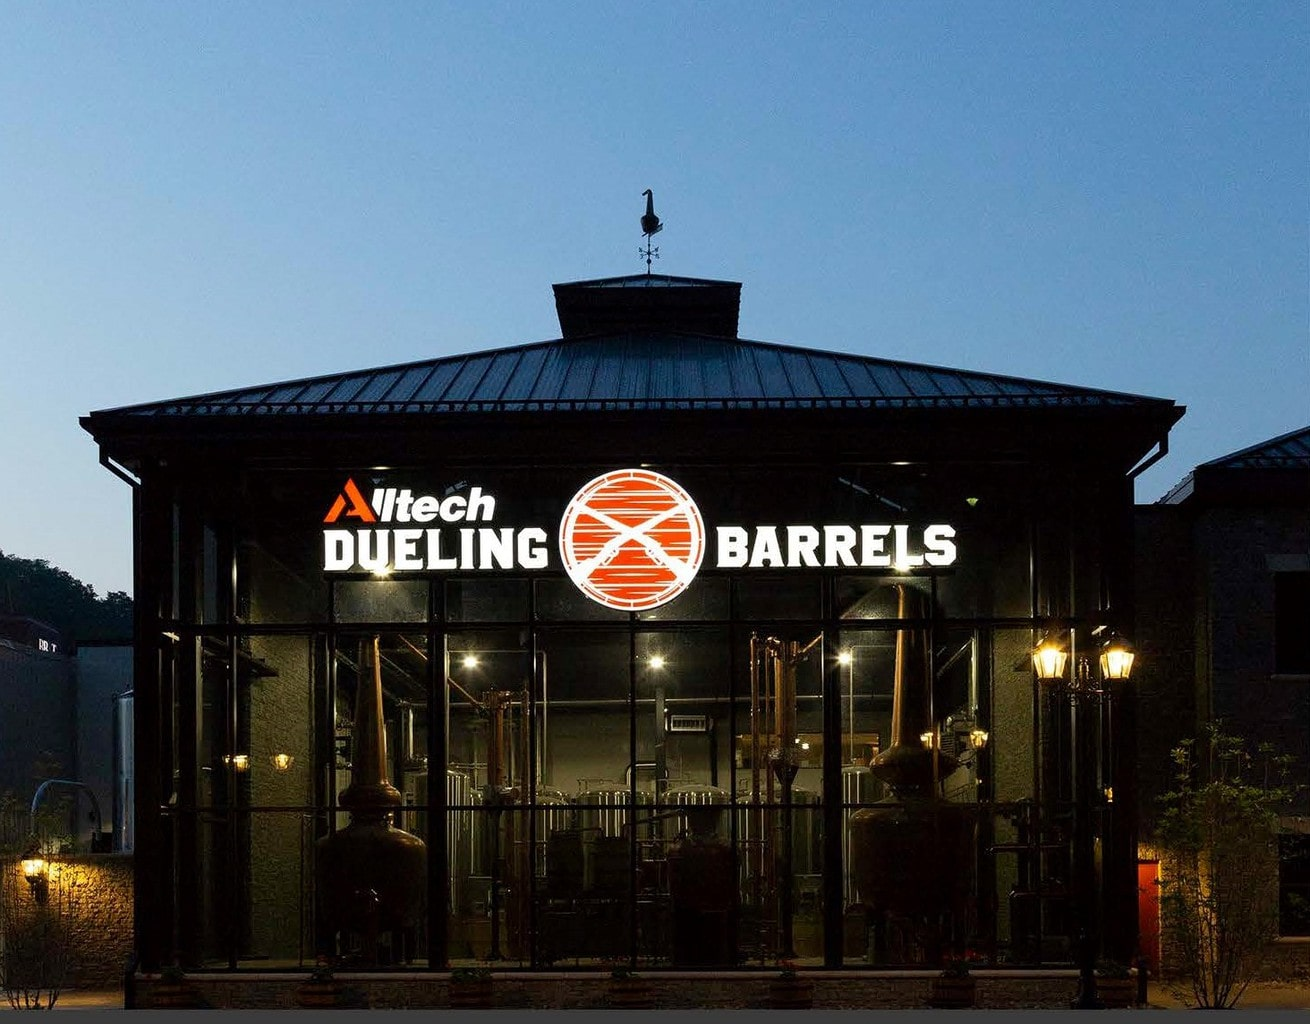 Alltech Dueling Barrels